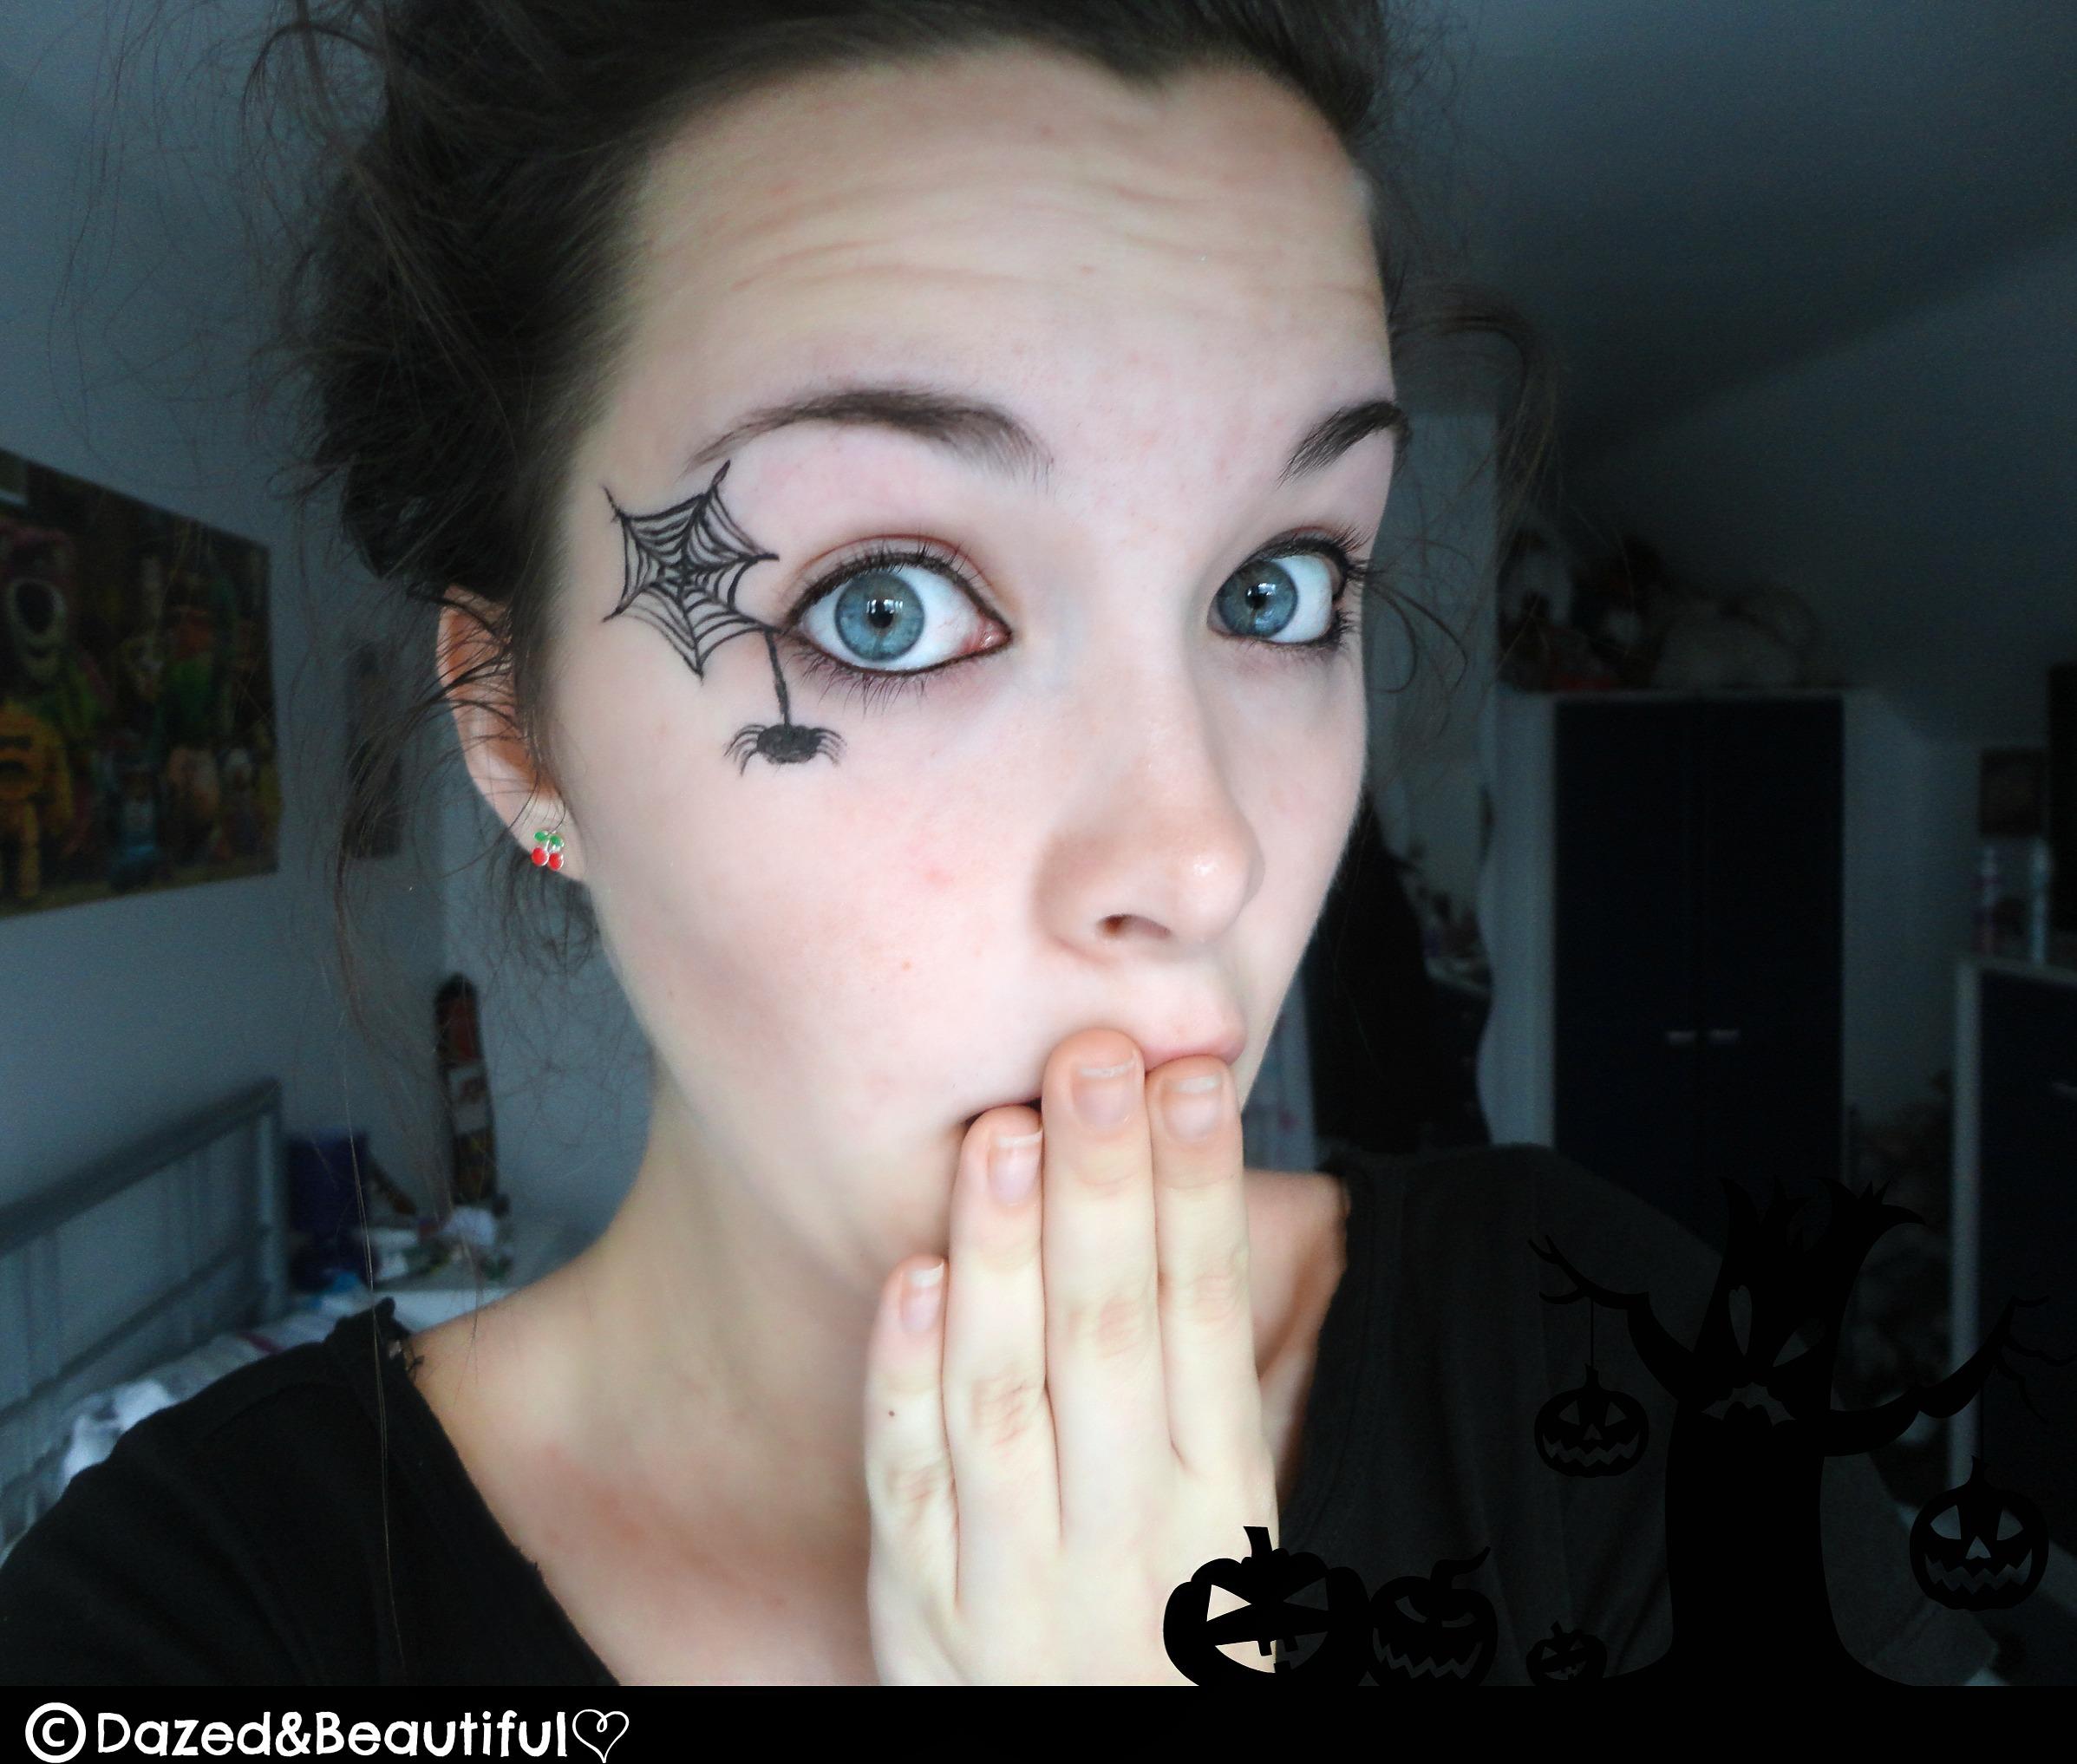 Spider Eye Makeup Dazed&ampBeautiful - Pretty Halloween Eye Makeup